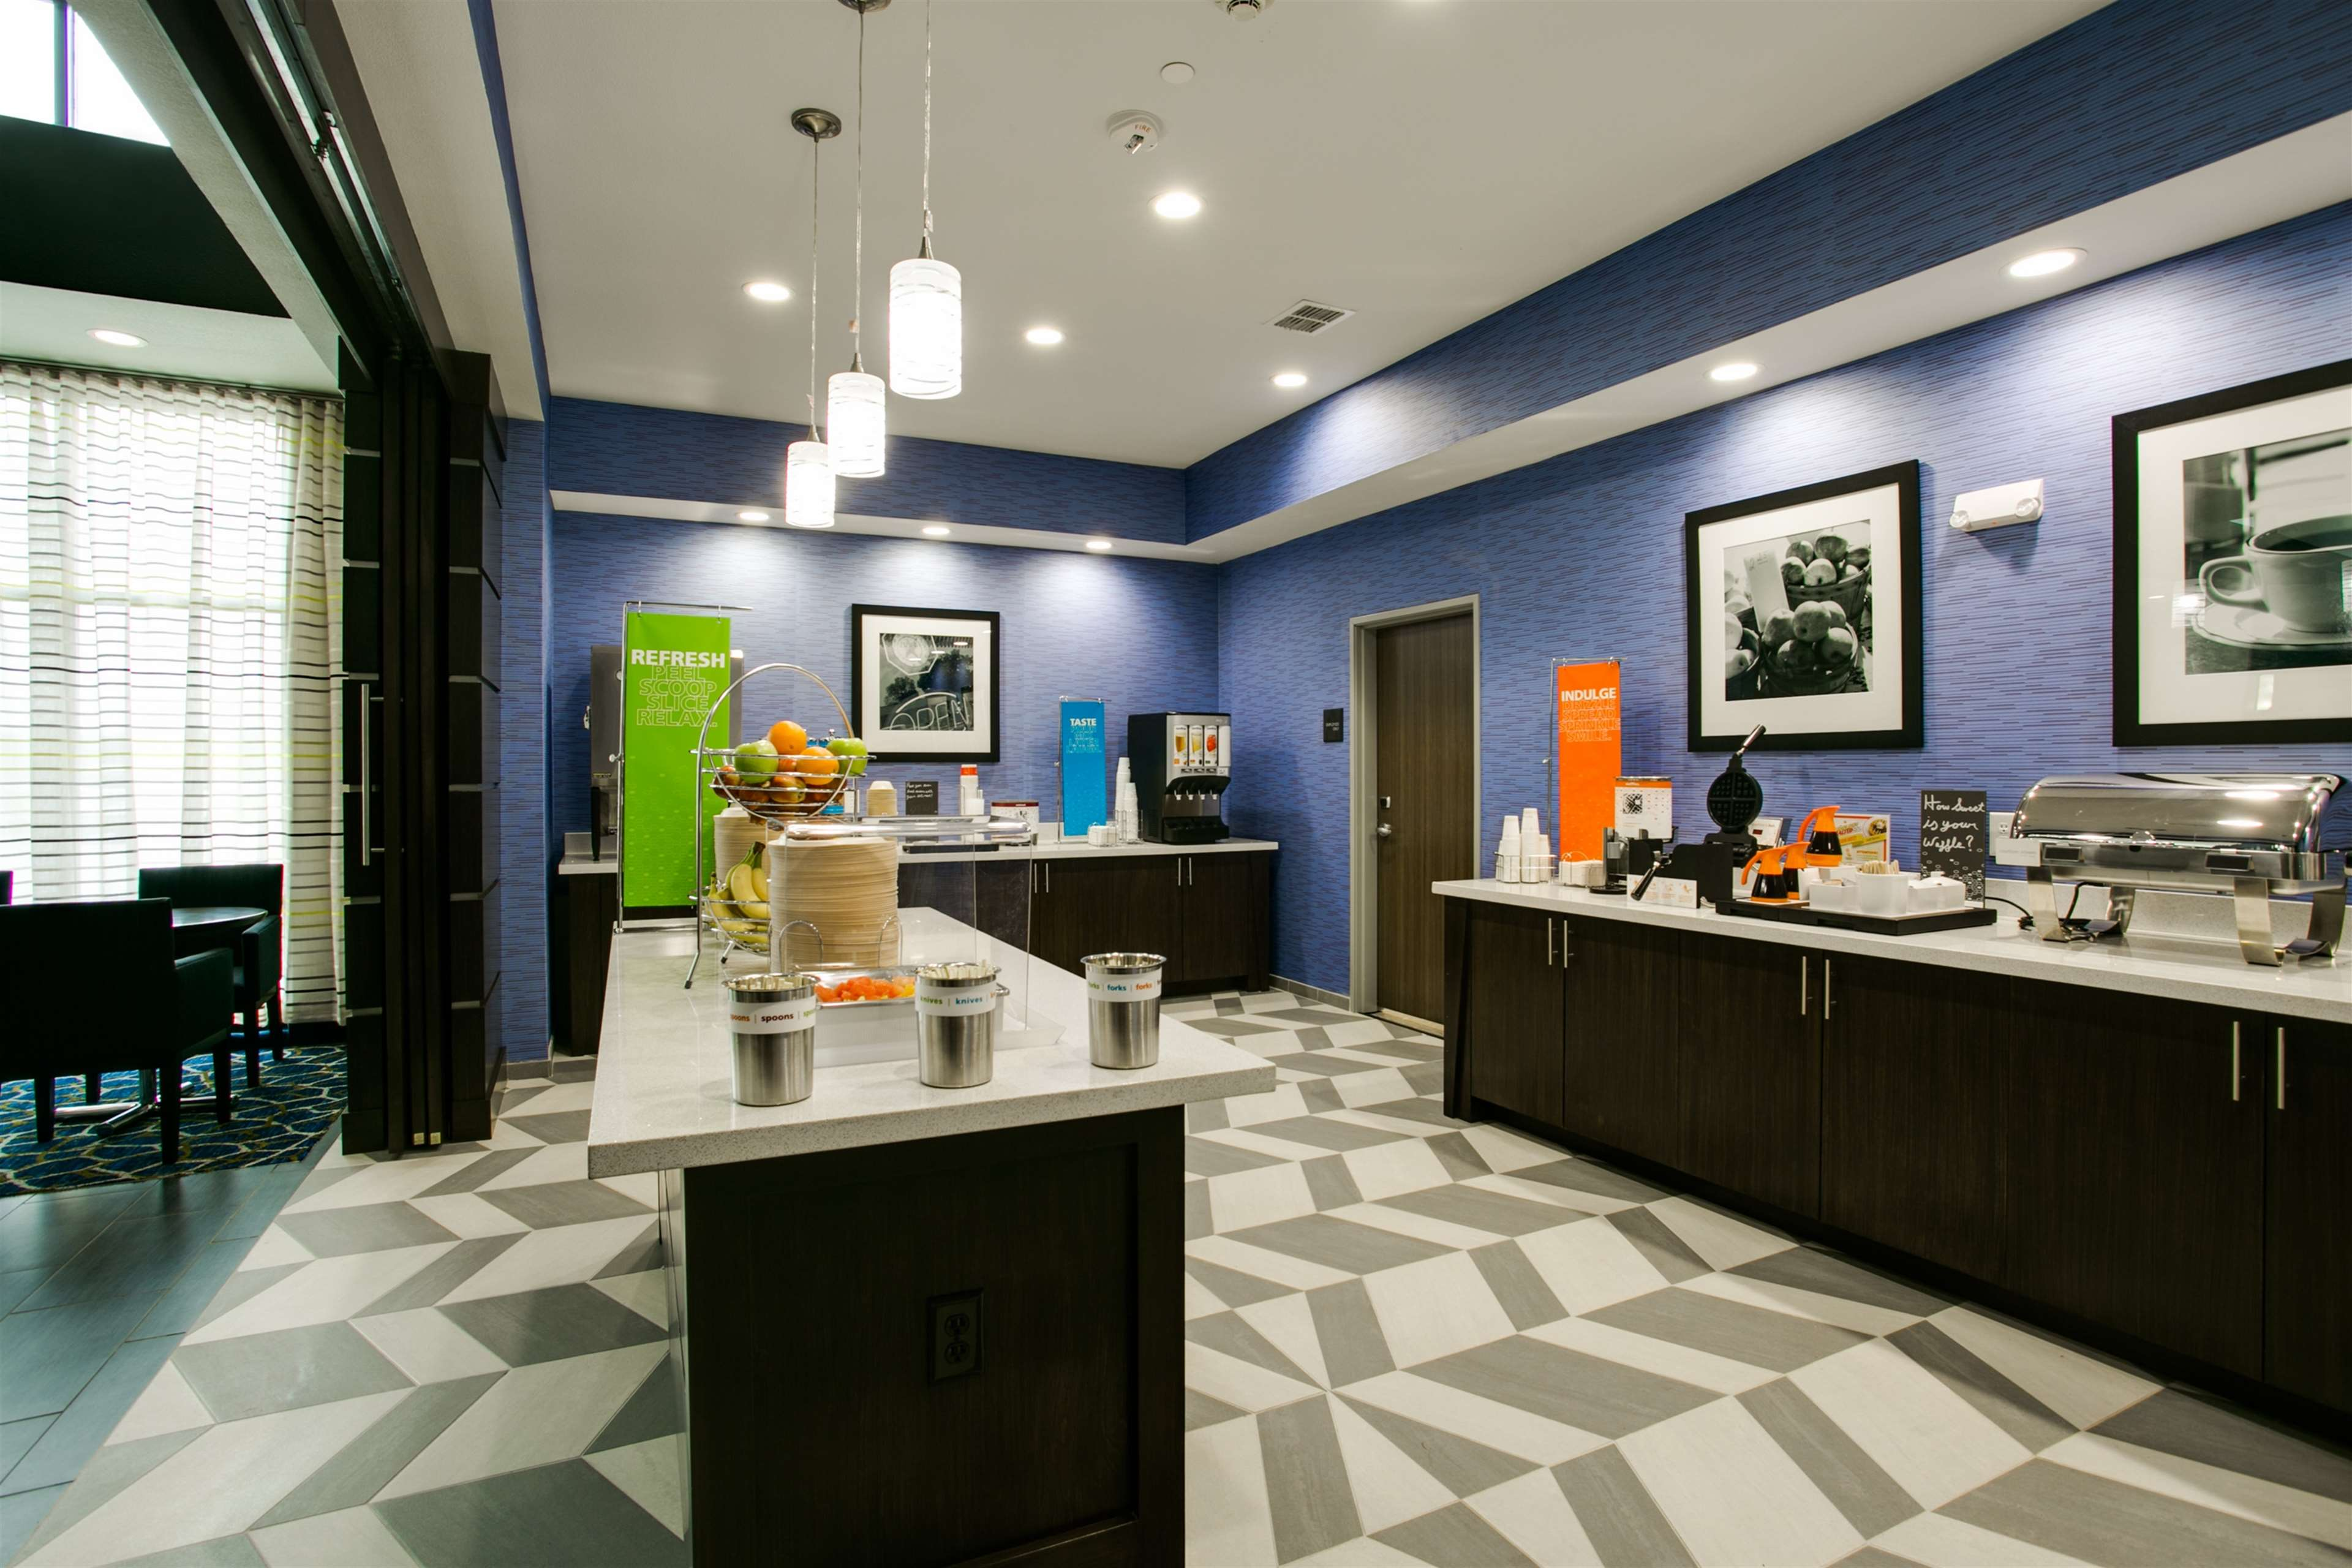 Hampton Inn & Suites Dallas/Ft. Worth Airport South image 10